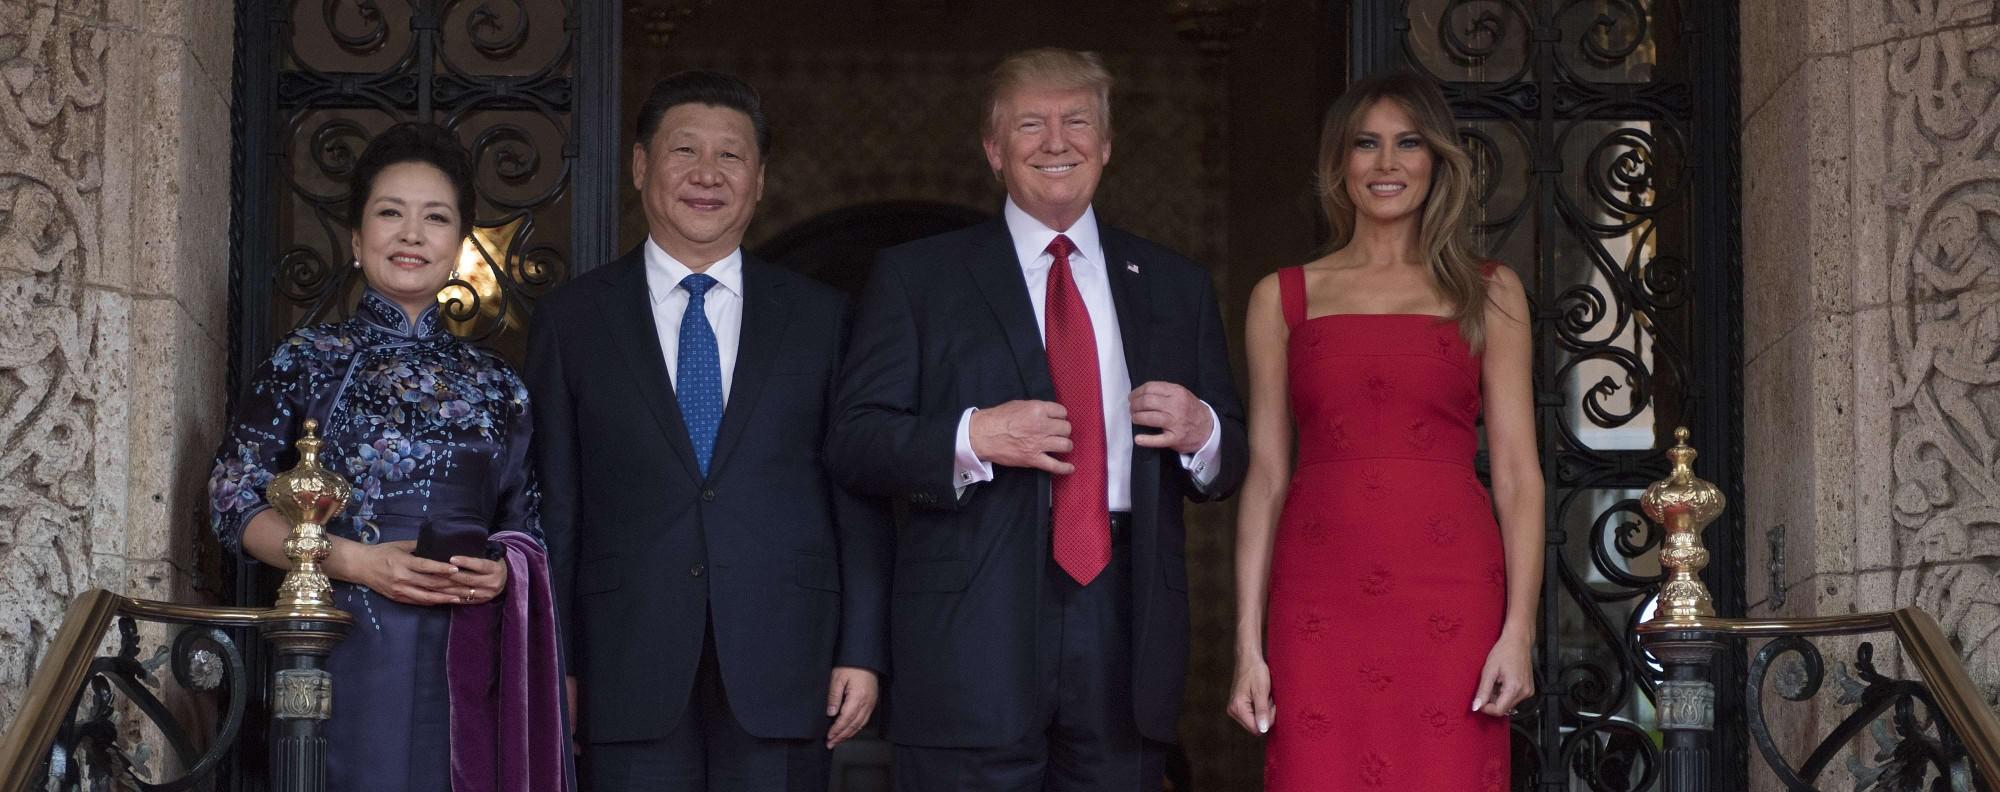 Xi and Trump with wives Peng Liyuan and Melania. Photo: AFP